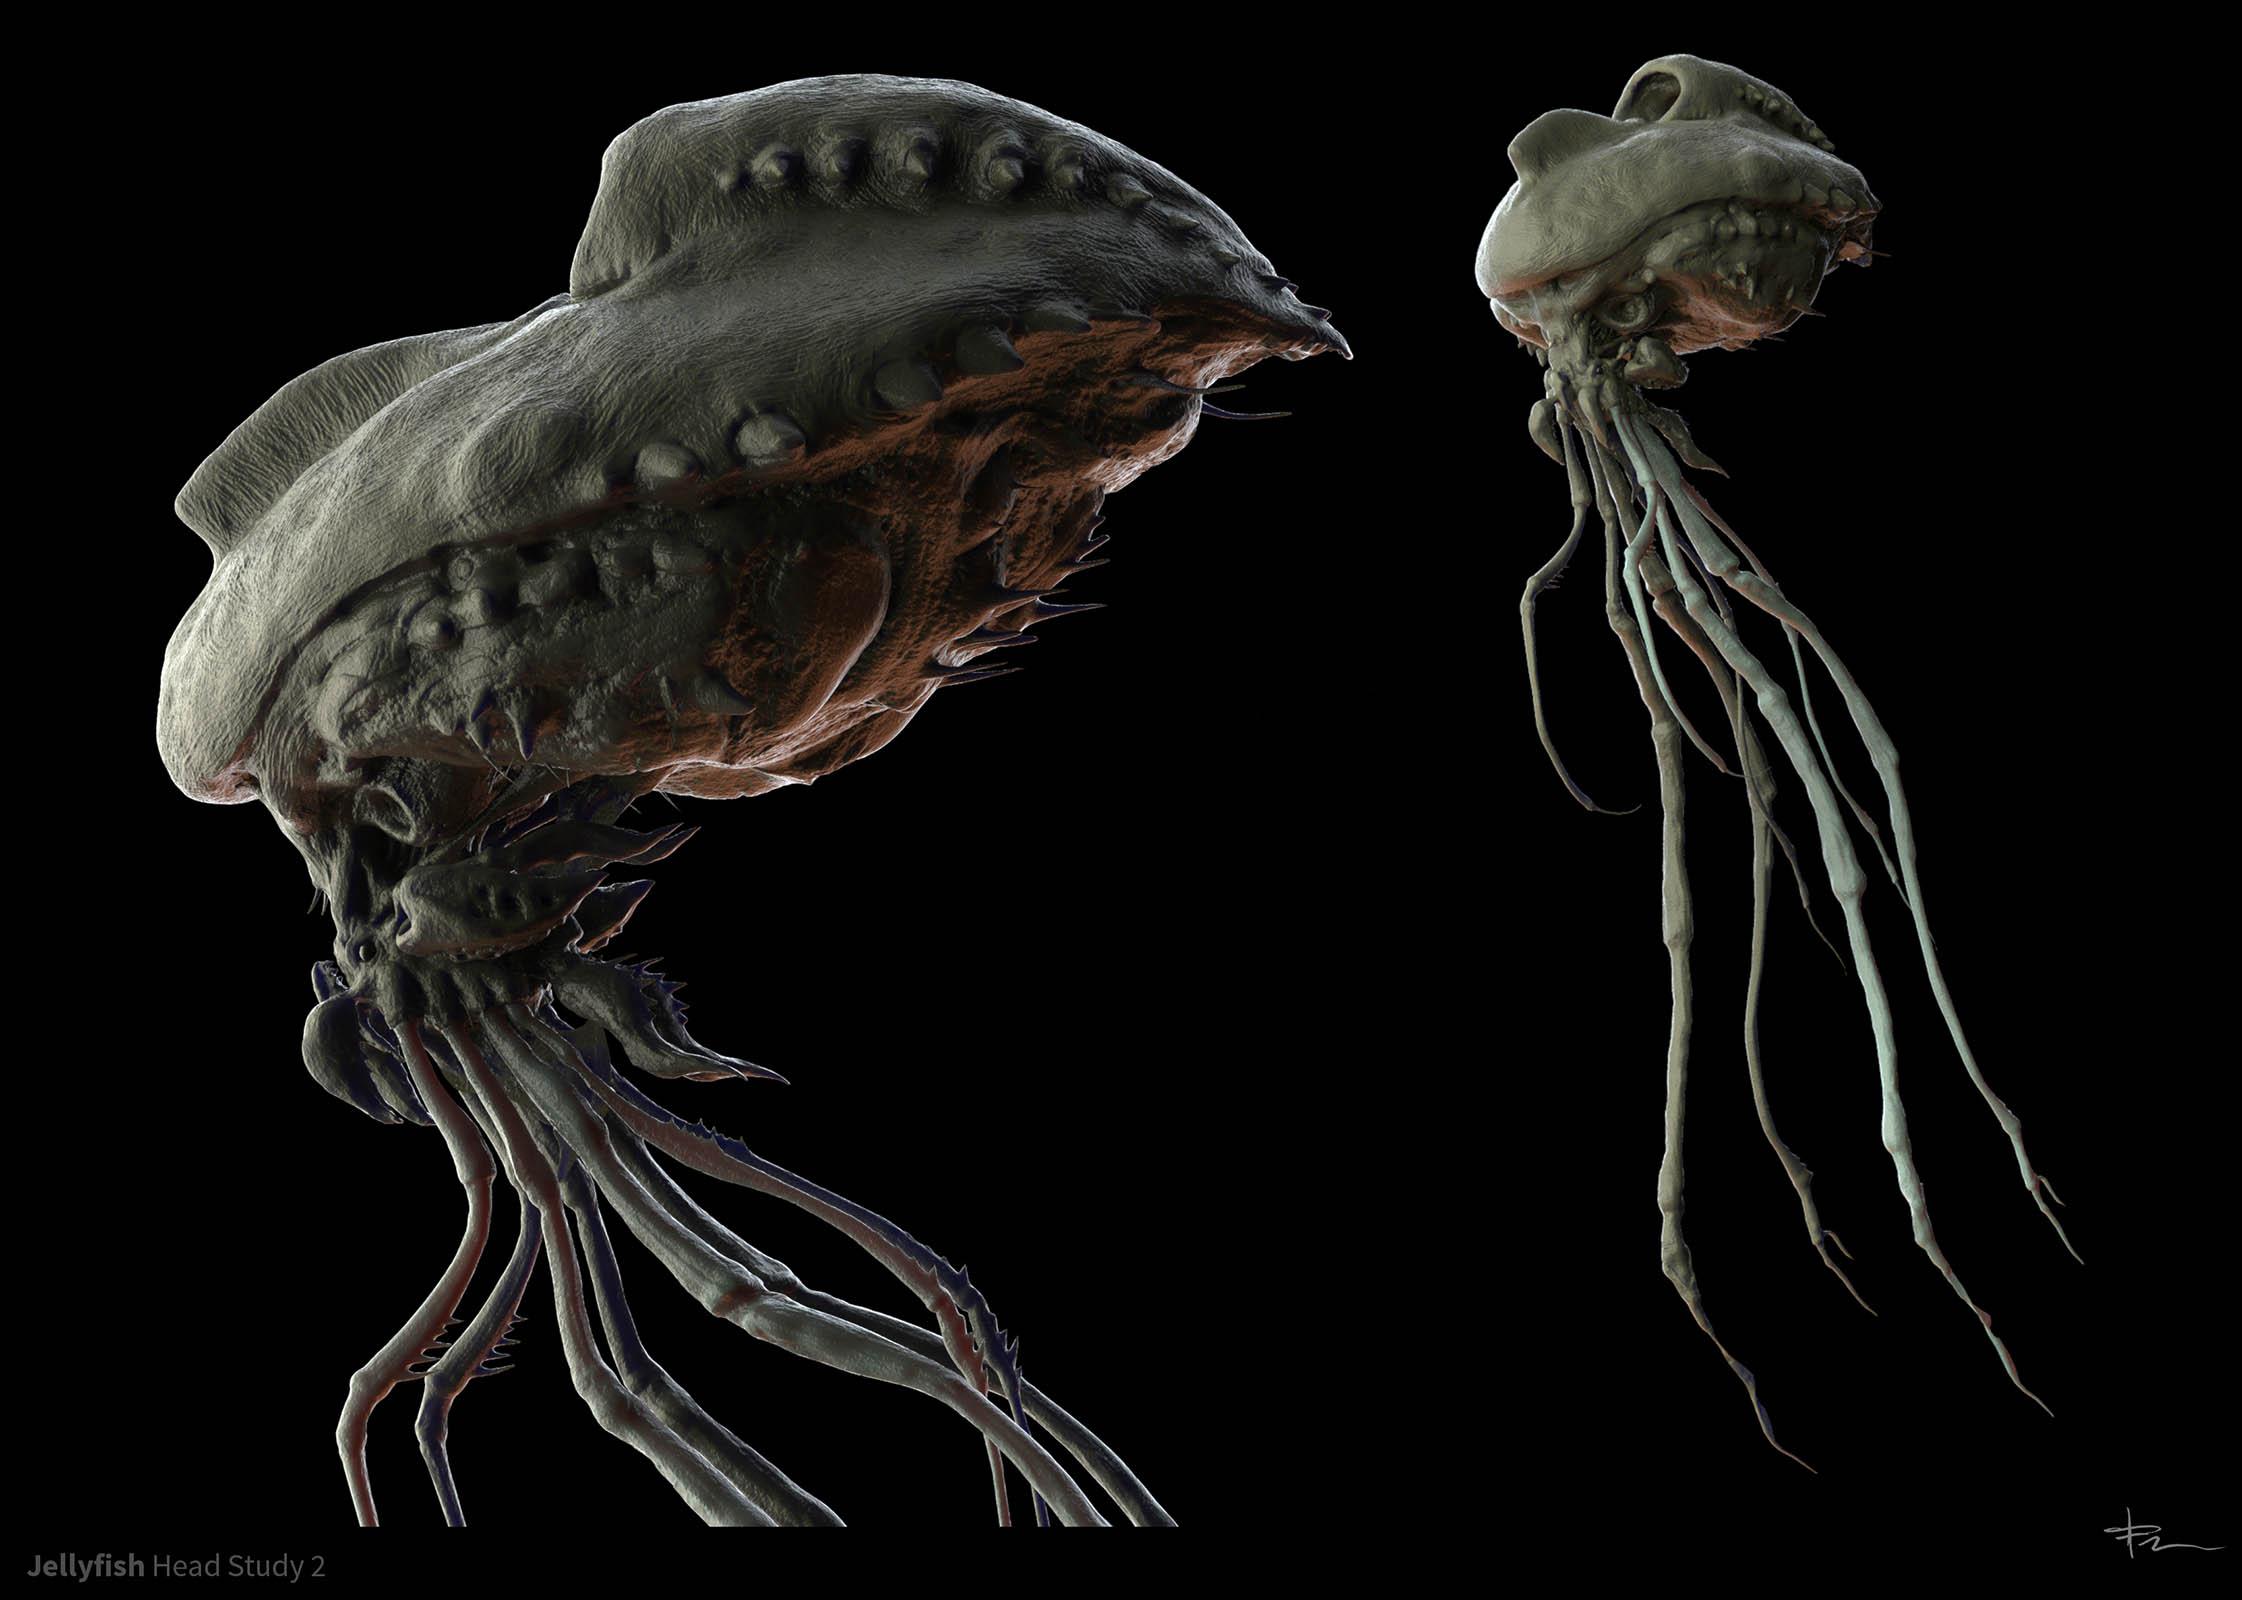 TJFRame-Art_CanceledProj_JellyfishStudy2.jpg